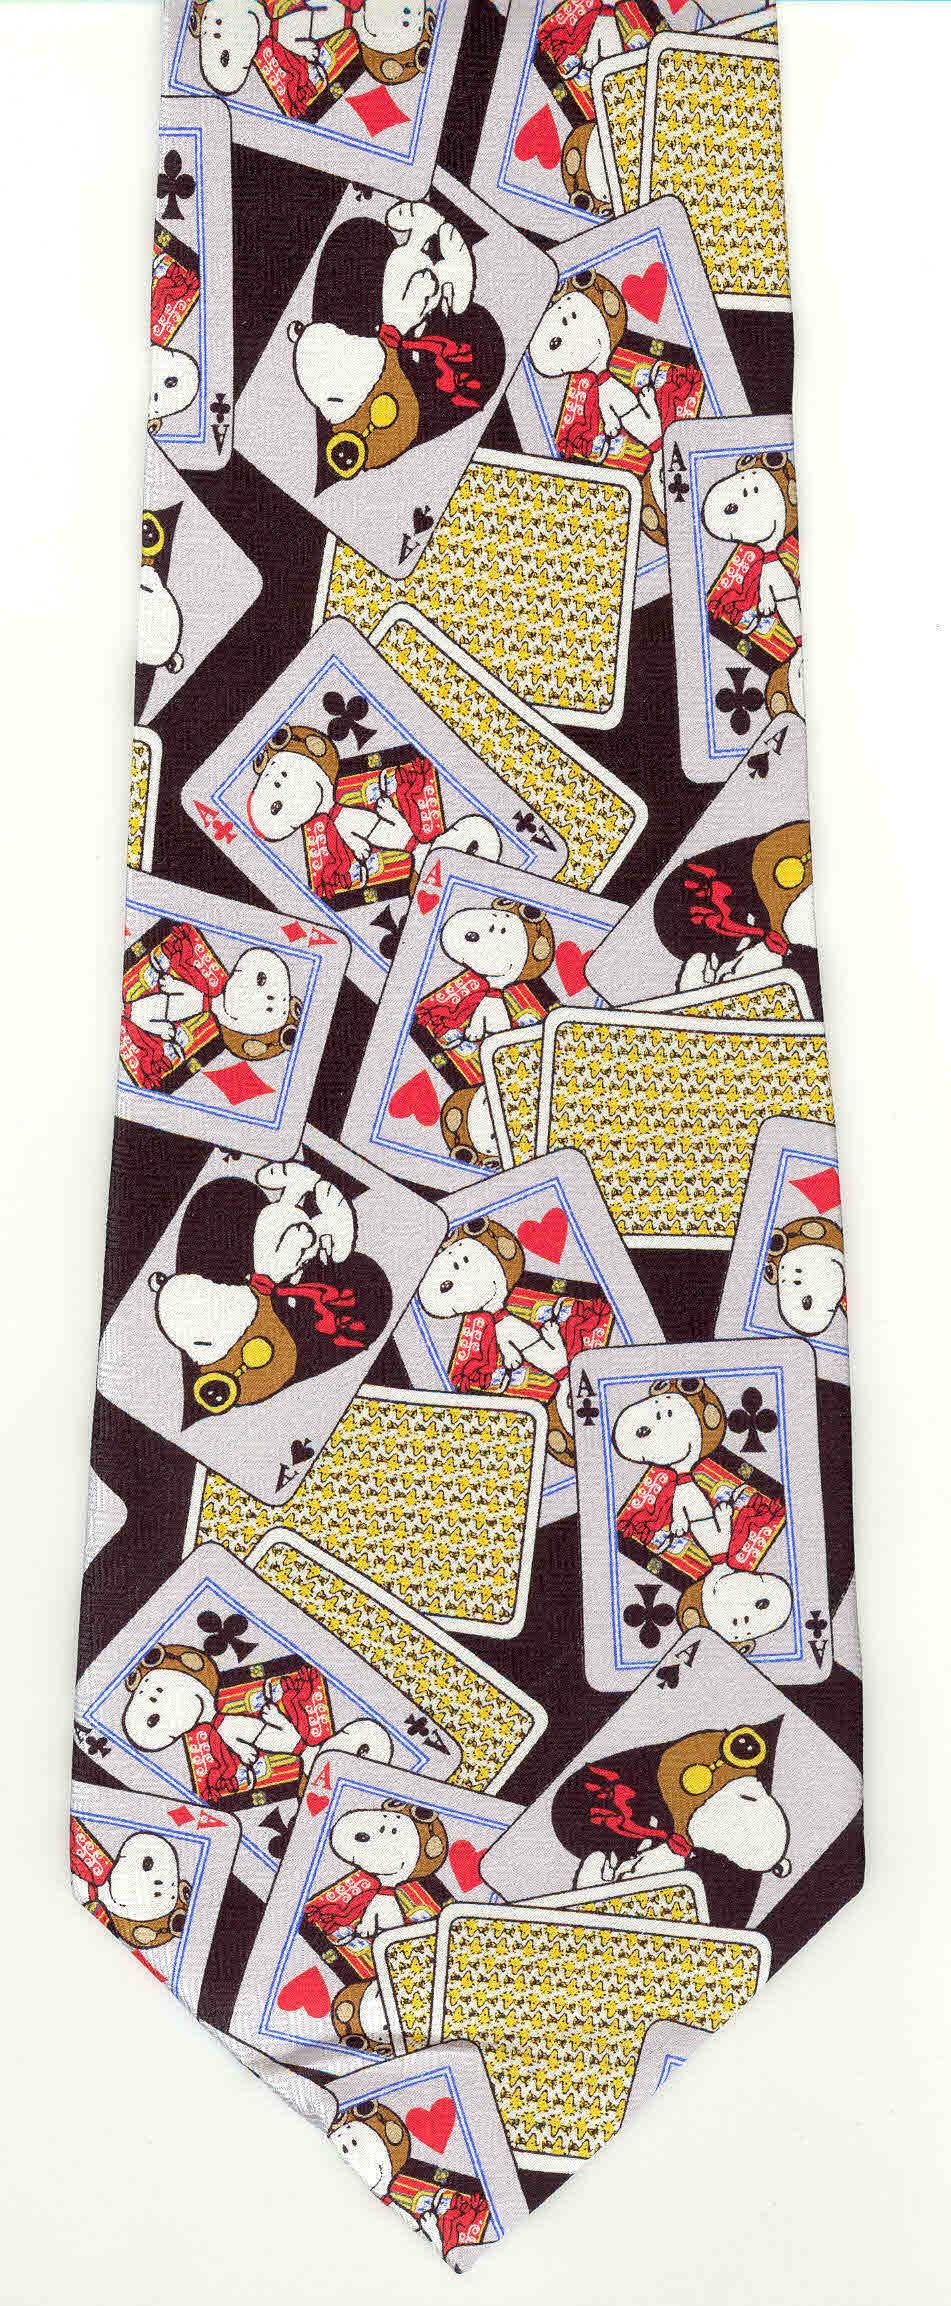 108 Snoopy Flying (BD).jpg